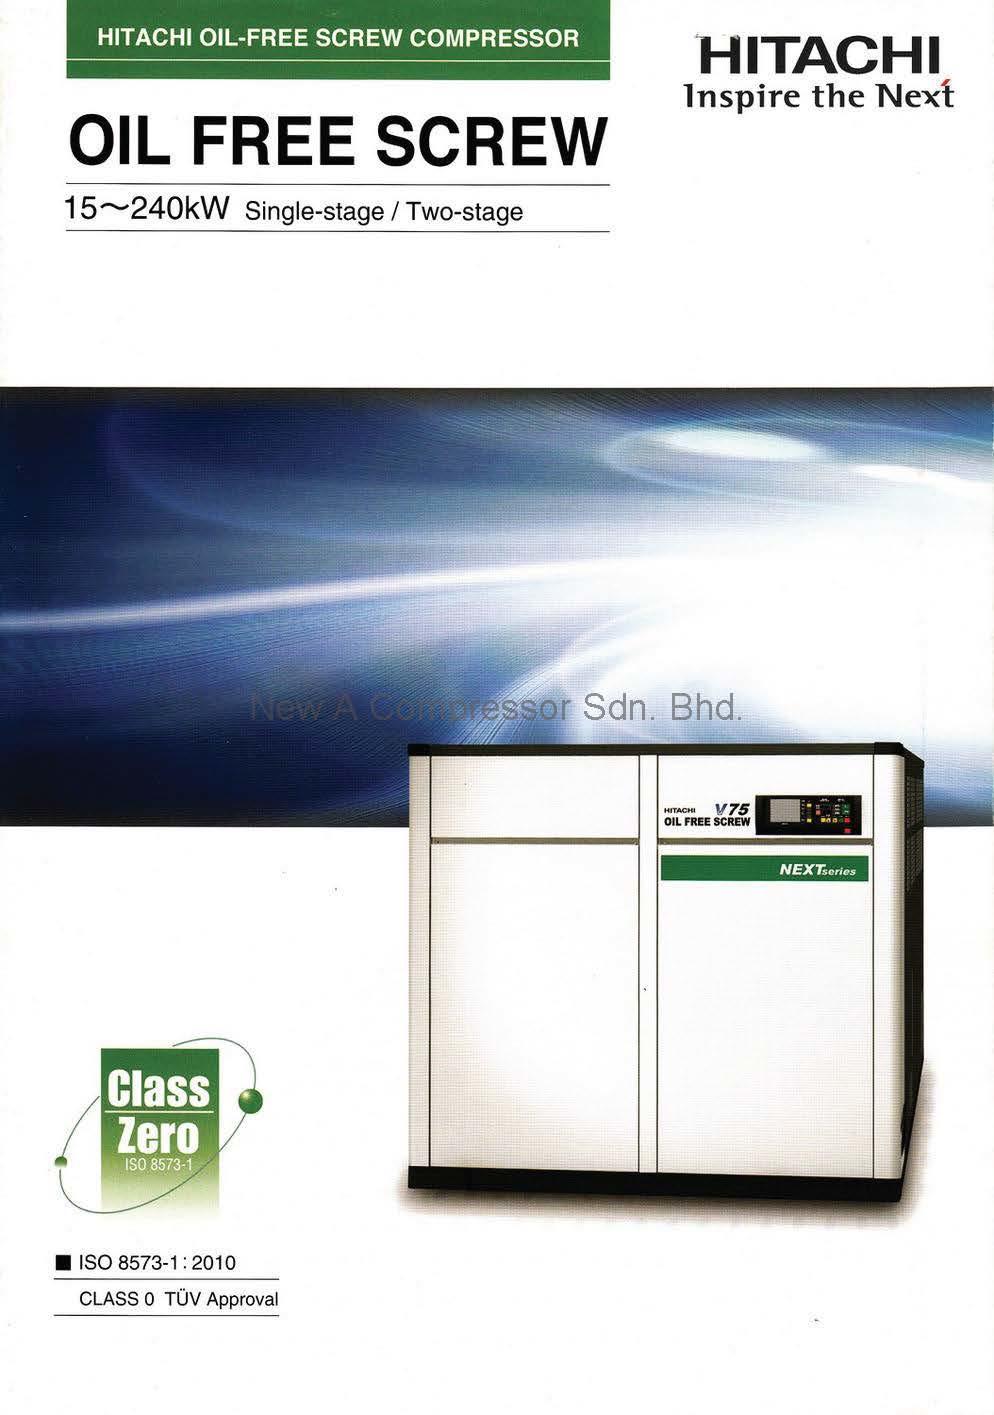 Hitachi Oil-Free Screw Compressor on Alka Engineering S